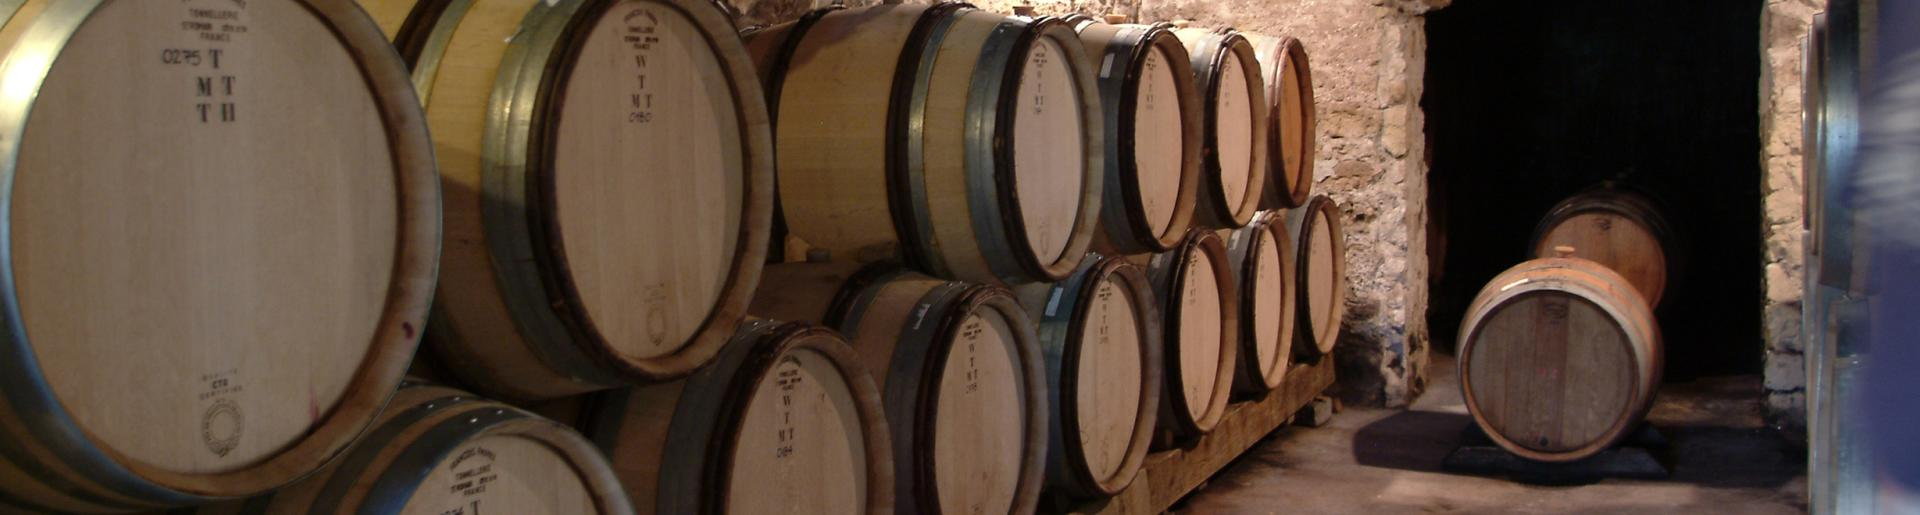 Wine barrels at Wollersheim Winery